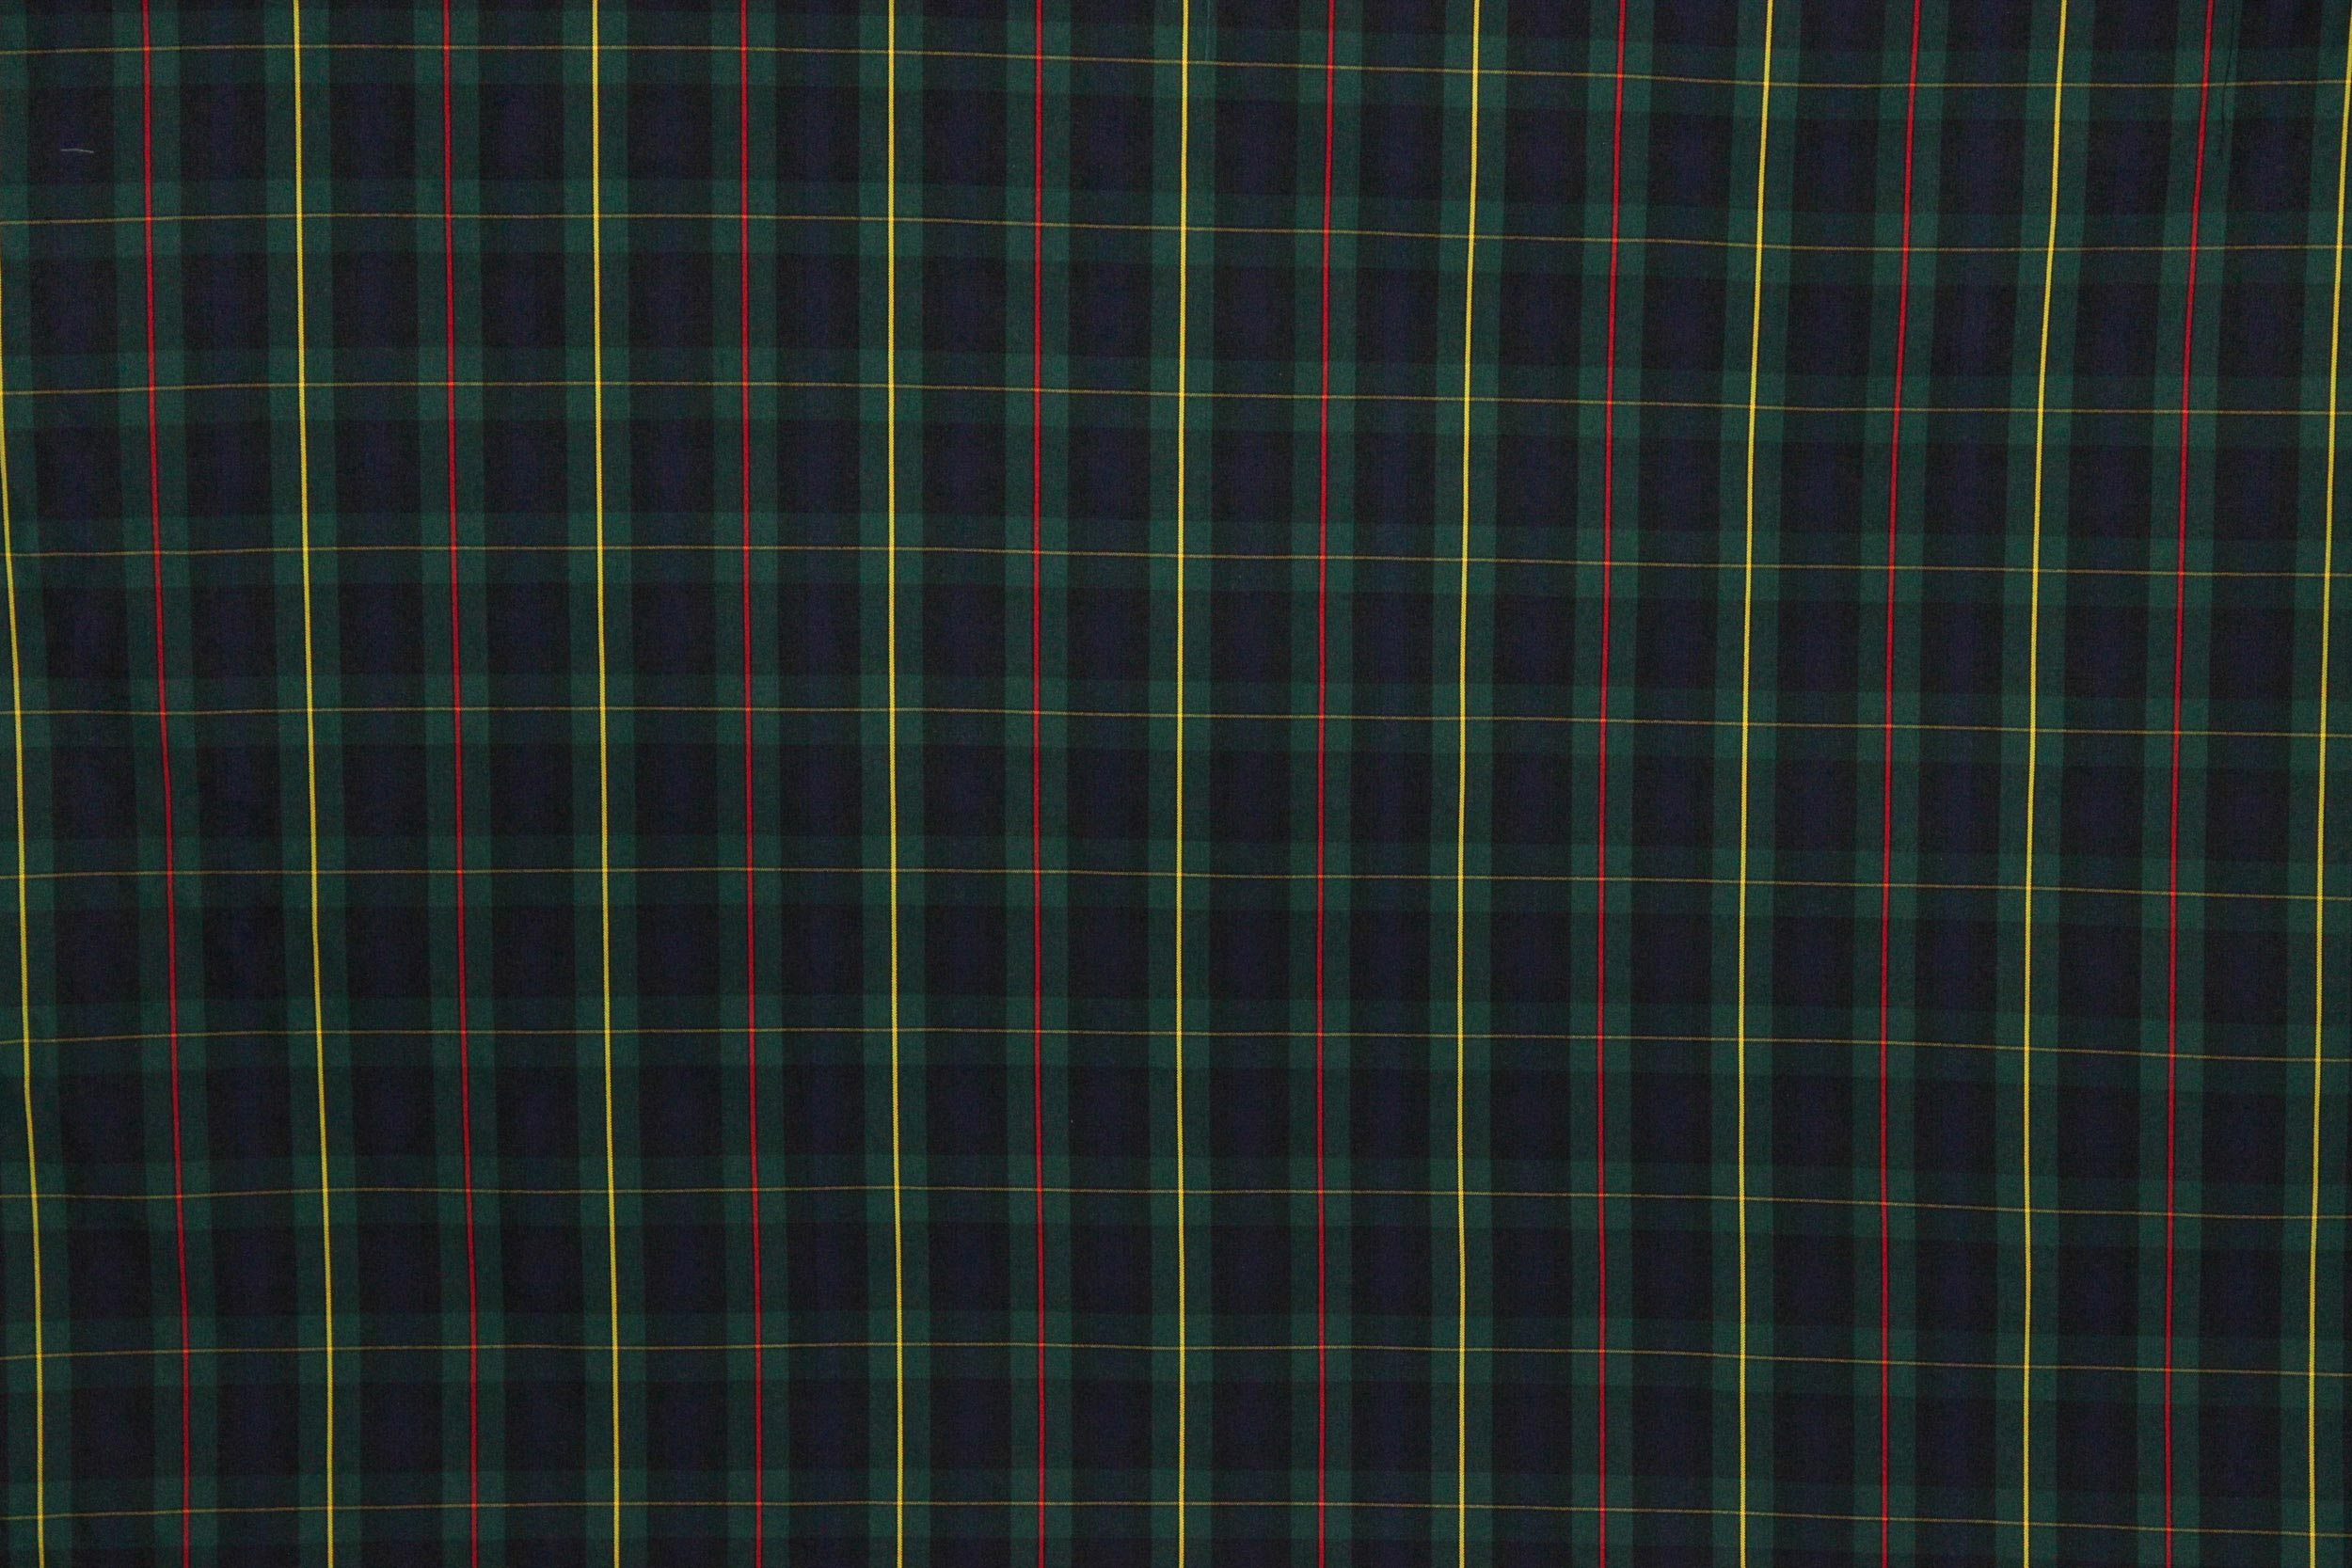 Tartan plaid fabric 28 images tartan plaid fabric for Decoller du carrelage